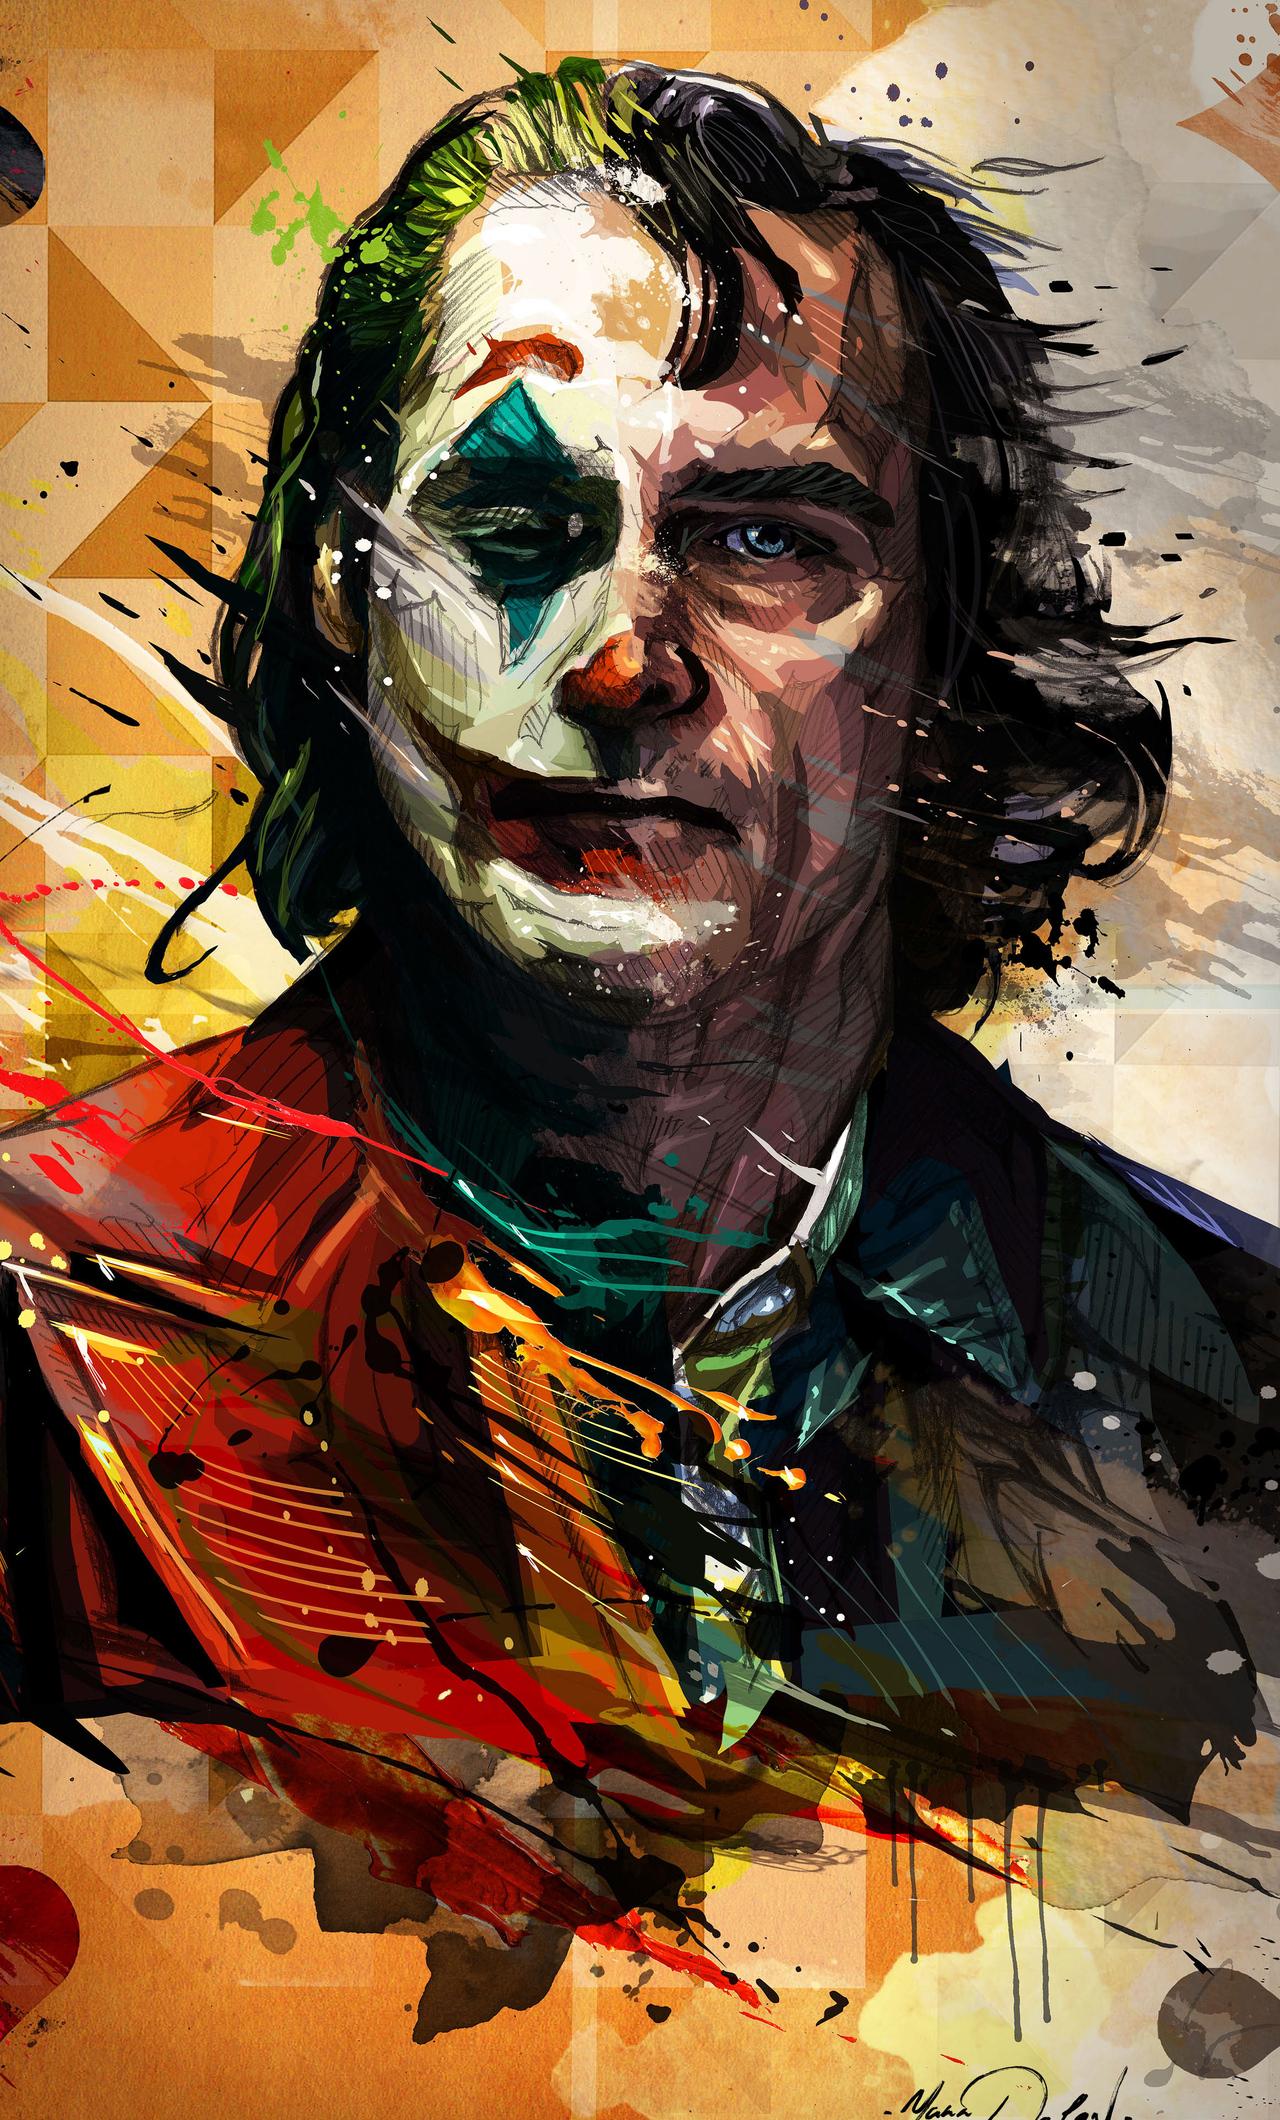 1280x2120 Joker 2019 Artwork Iphone 6 Hd 4k Wallpapers